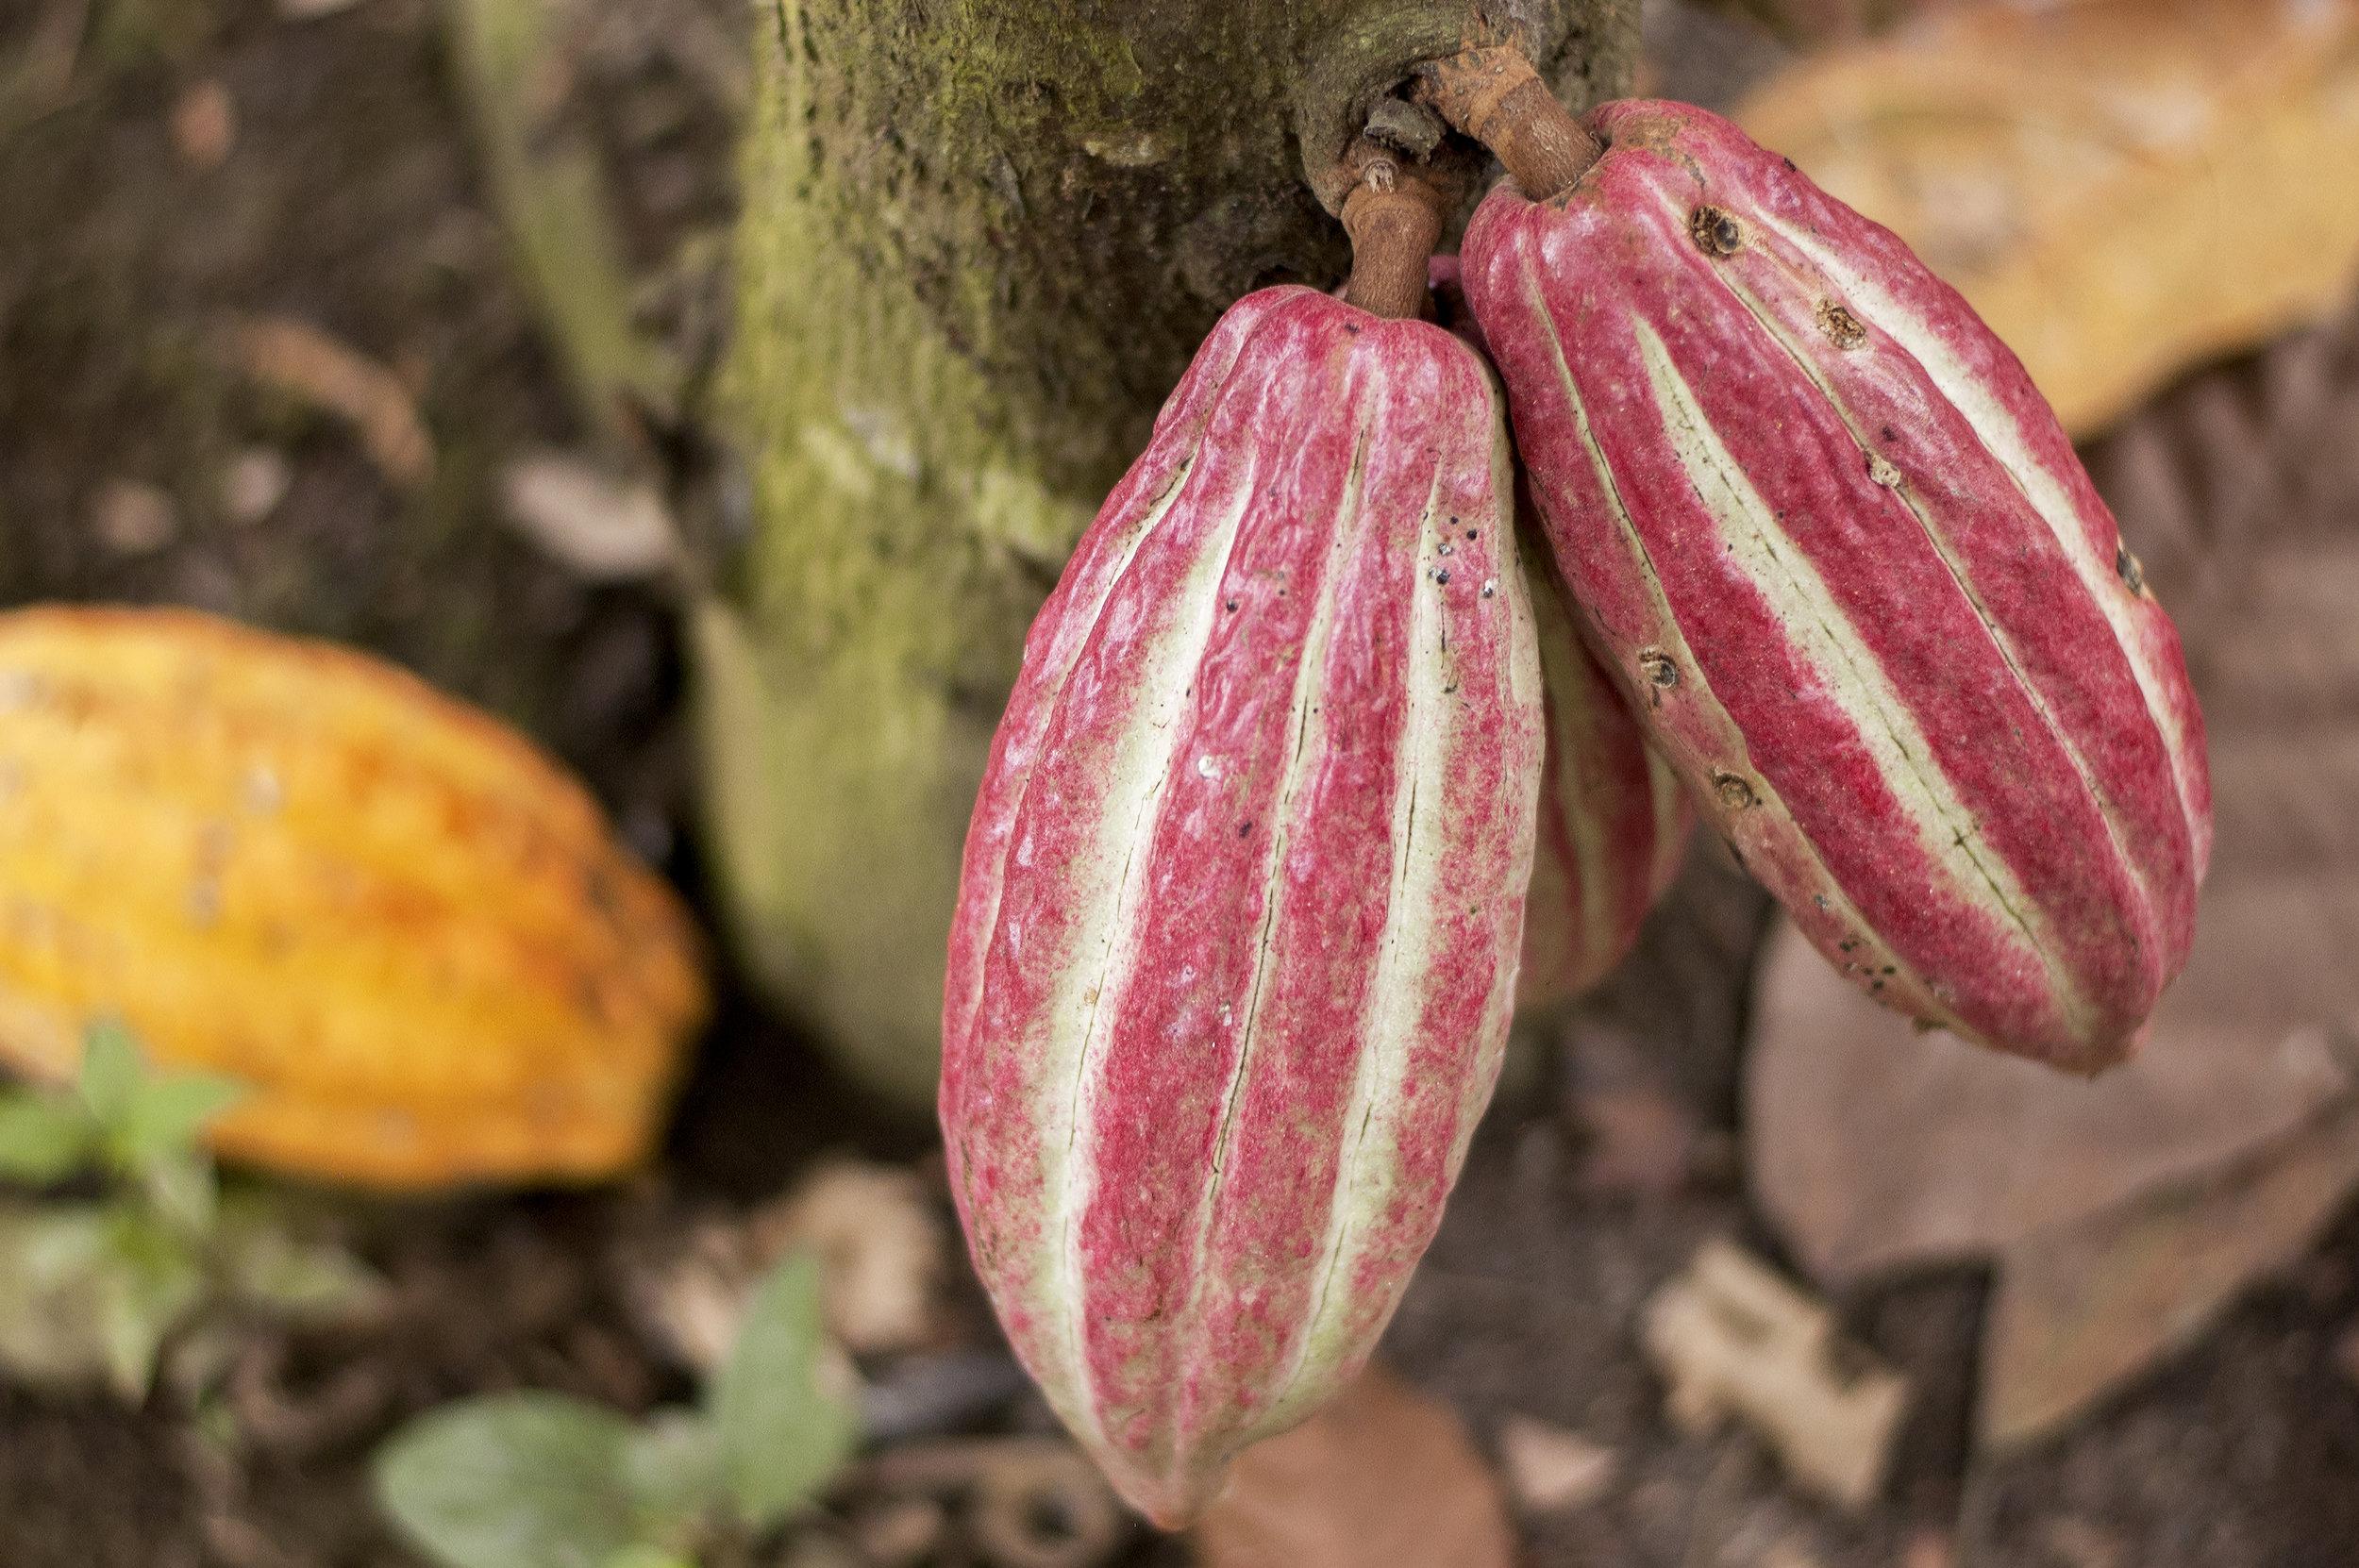 KAKAO_Ecuador_kakaofrukter_liggande_Fairtrade-Sverige.jpg